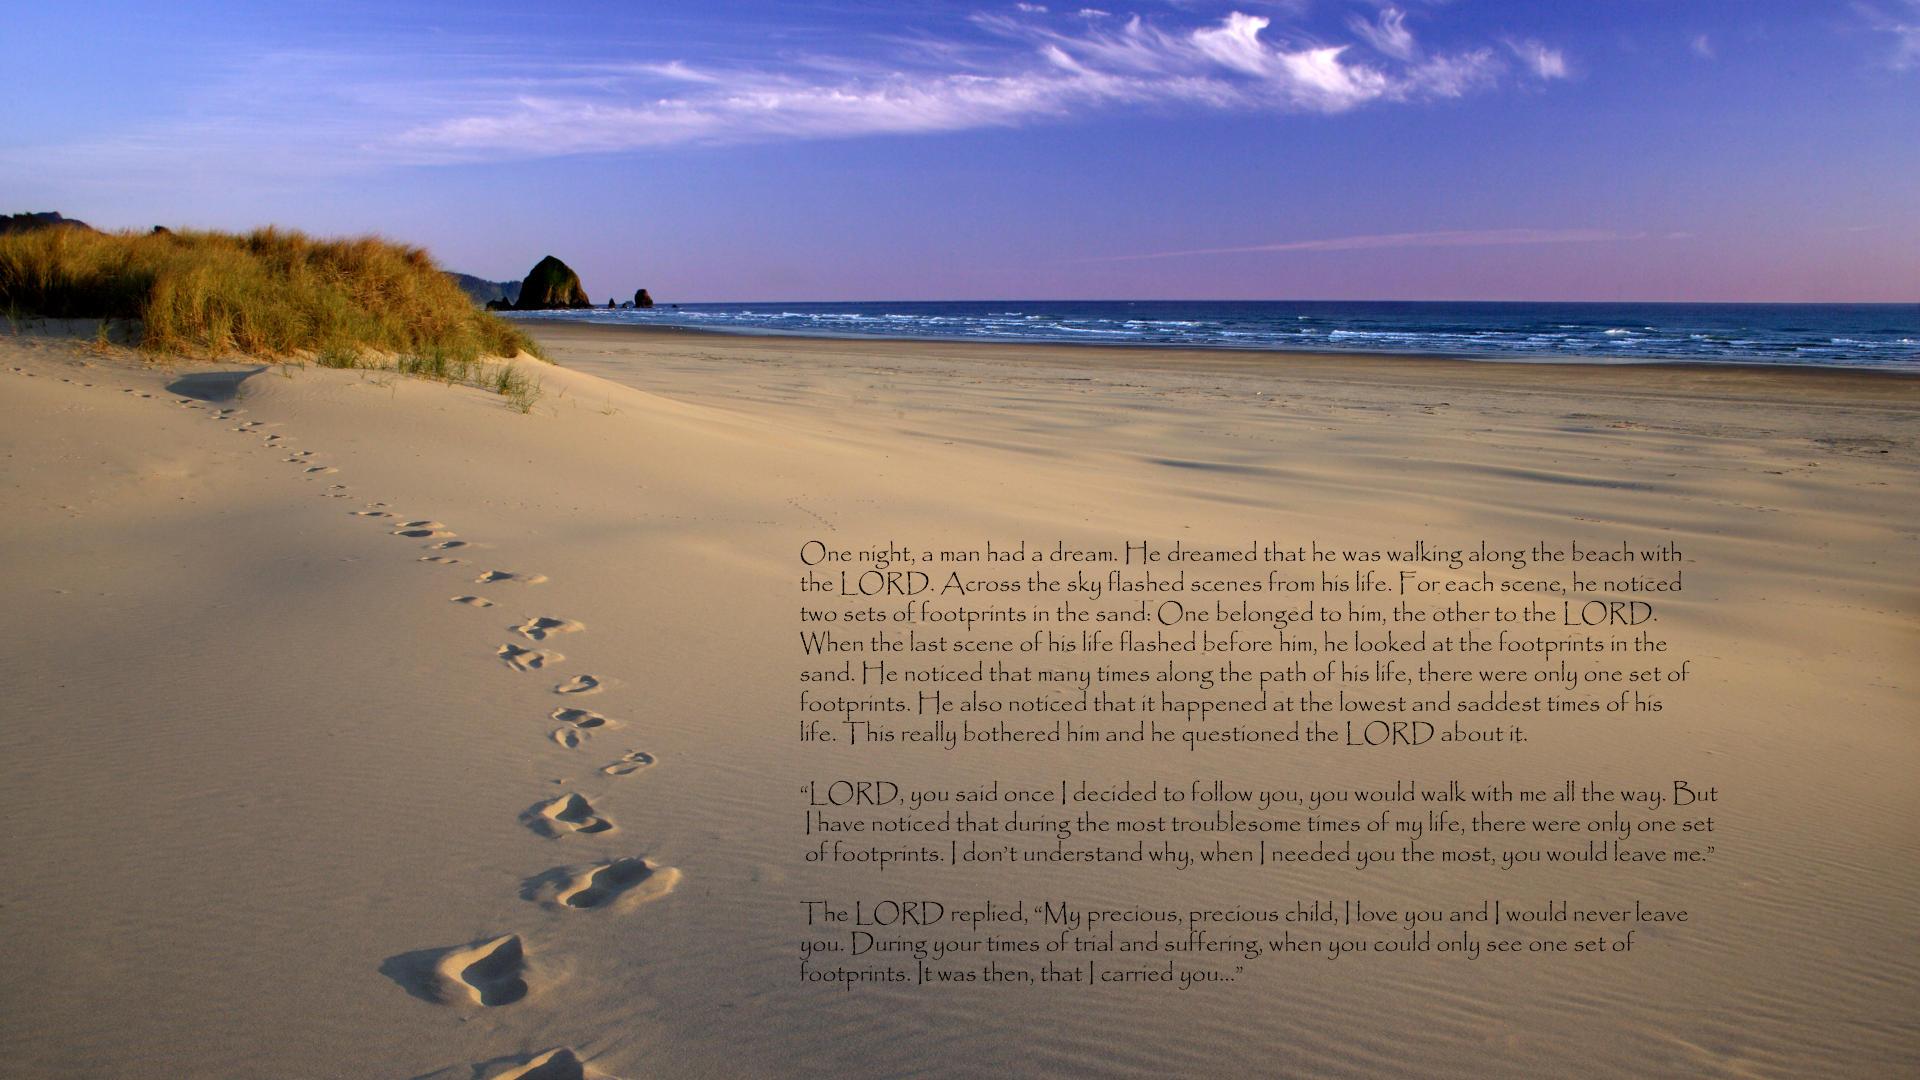 christian marriage today com spiritual ecards html filesize 200x150 1920x1080